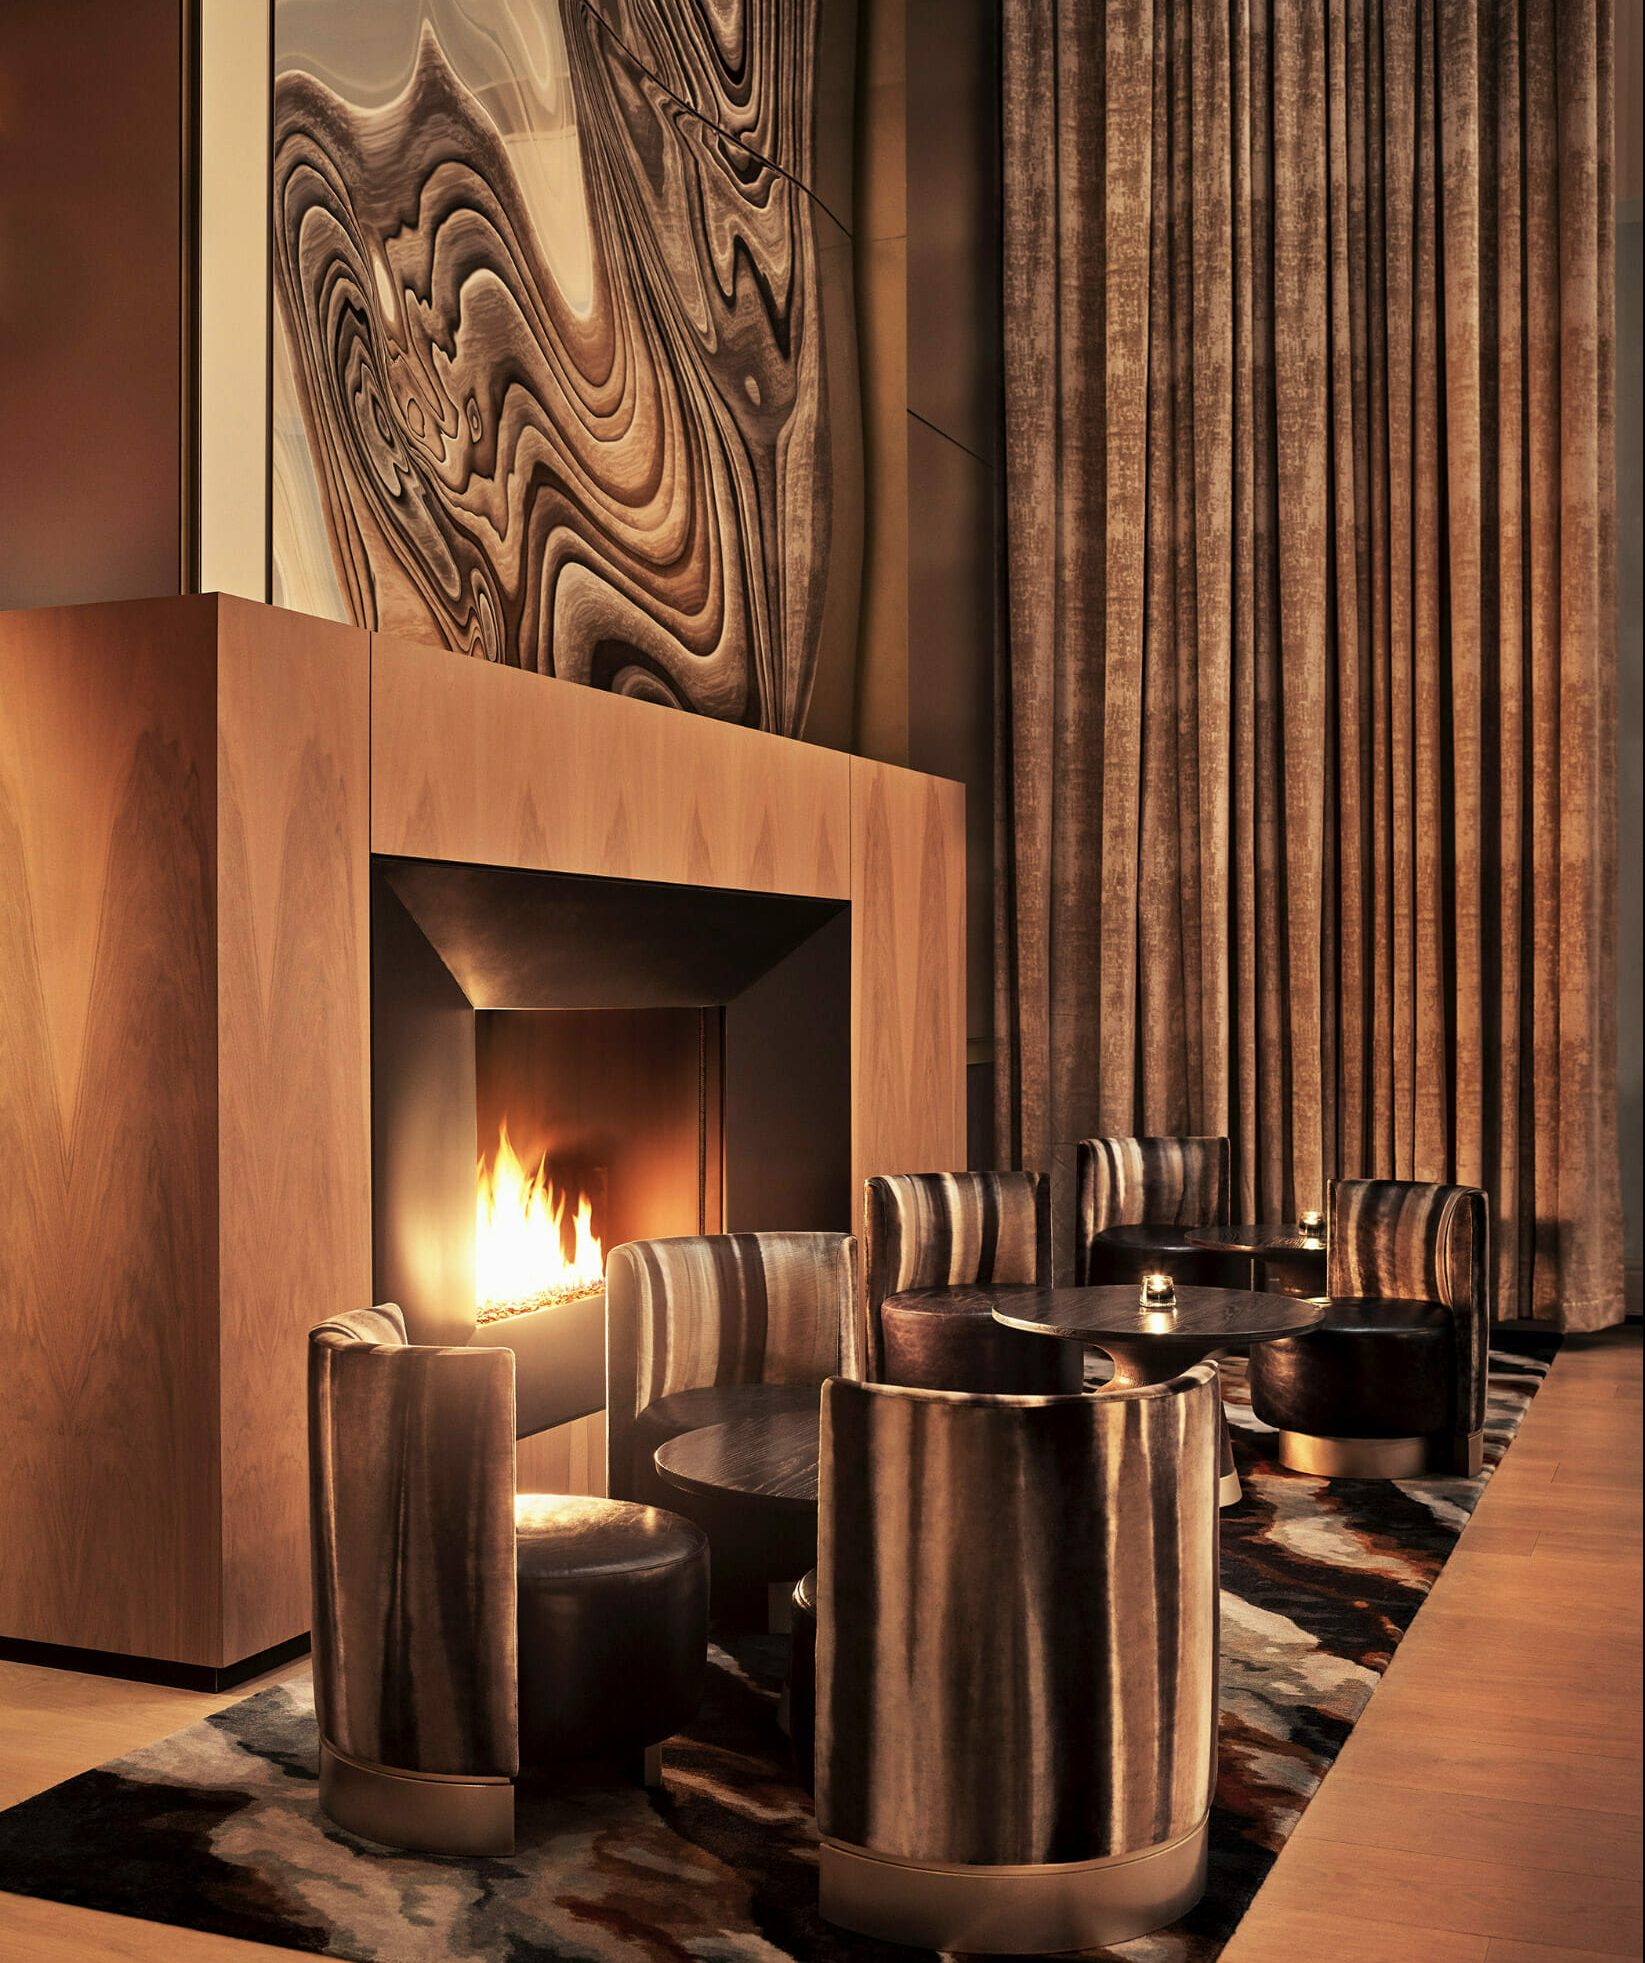 equinox hotel lounge fireplace